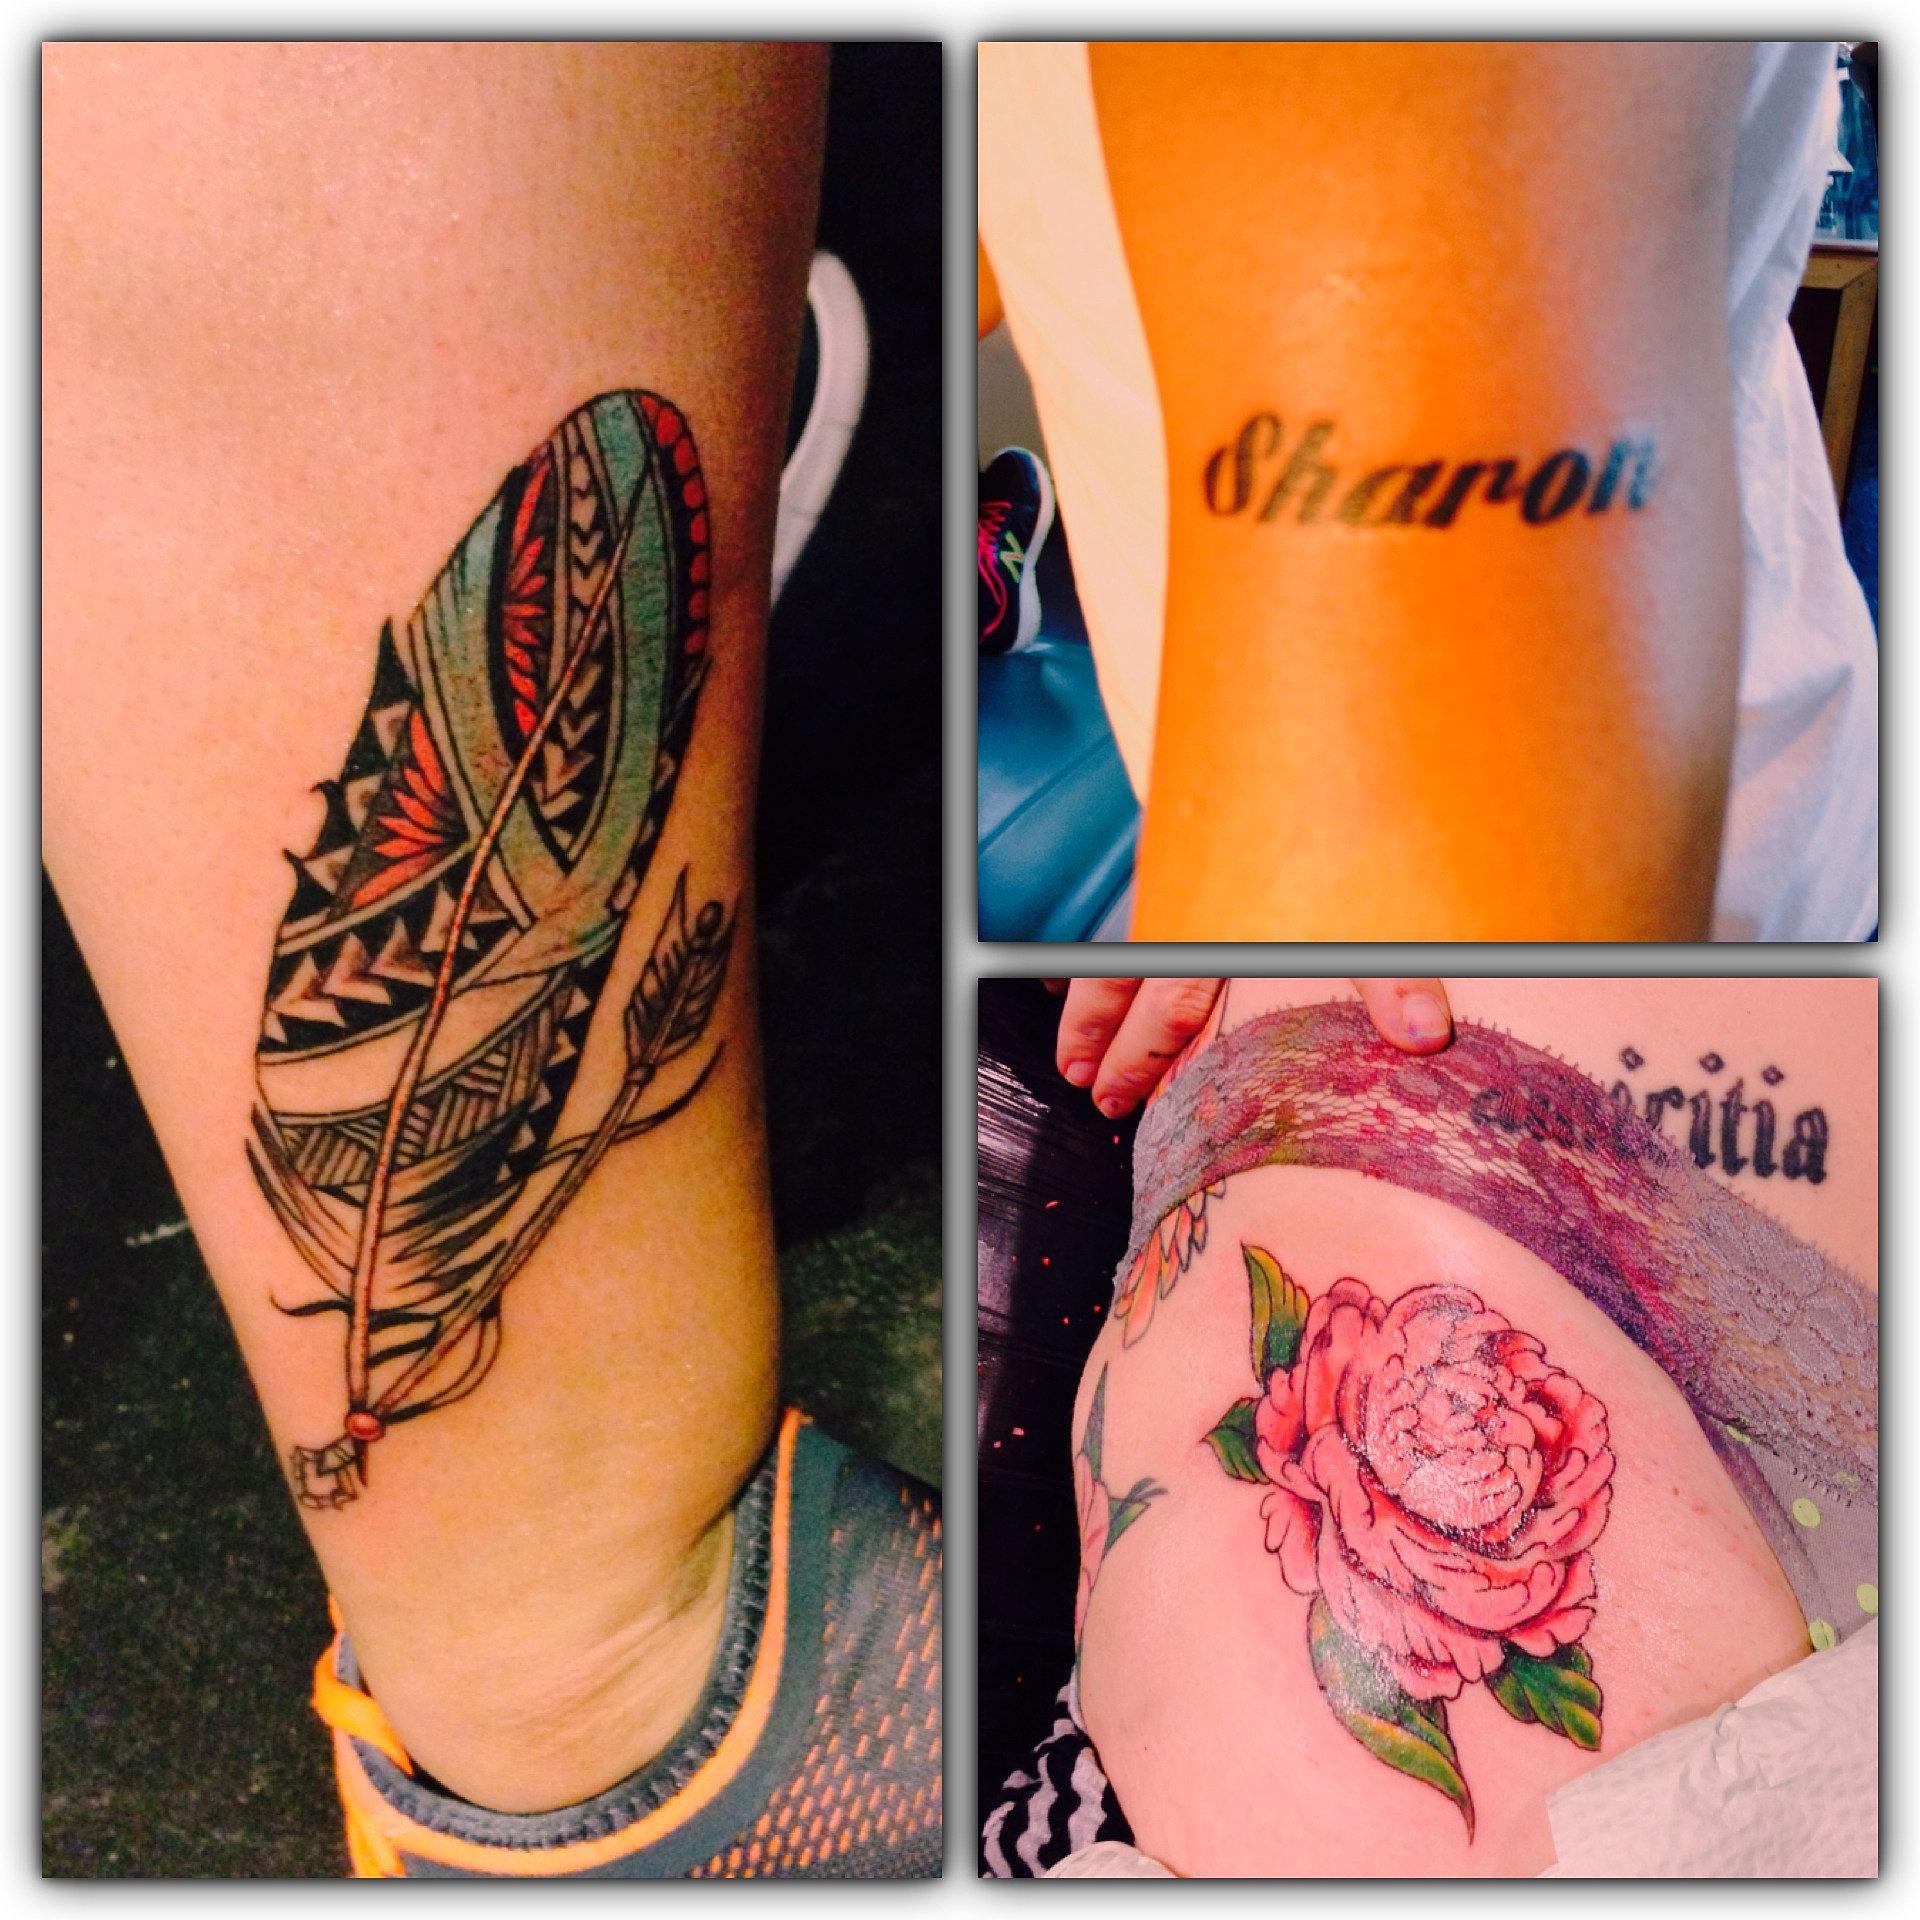 artist bay tattoo area tribal filipino tattoo coverupsGreat tattoo Bay artistGood artist tattoo freehand Area